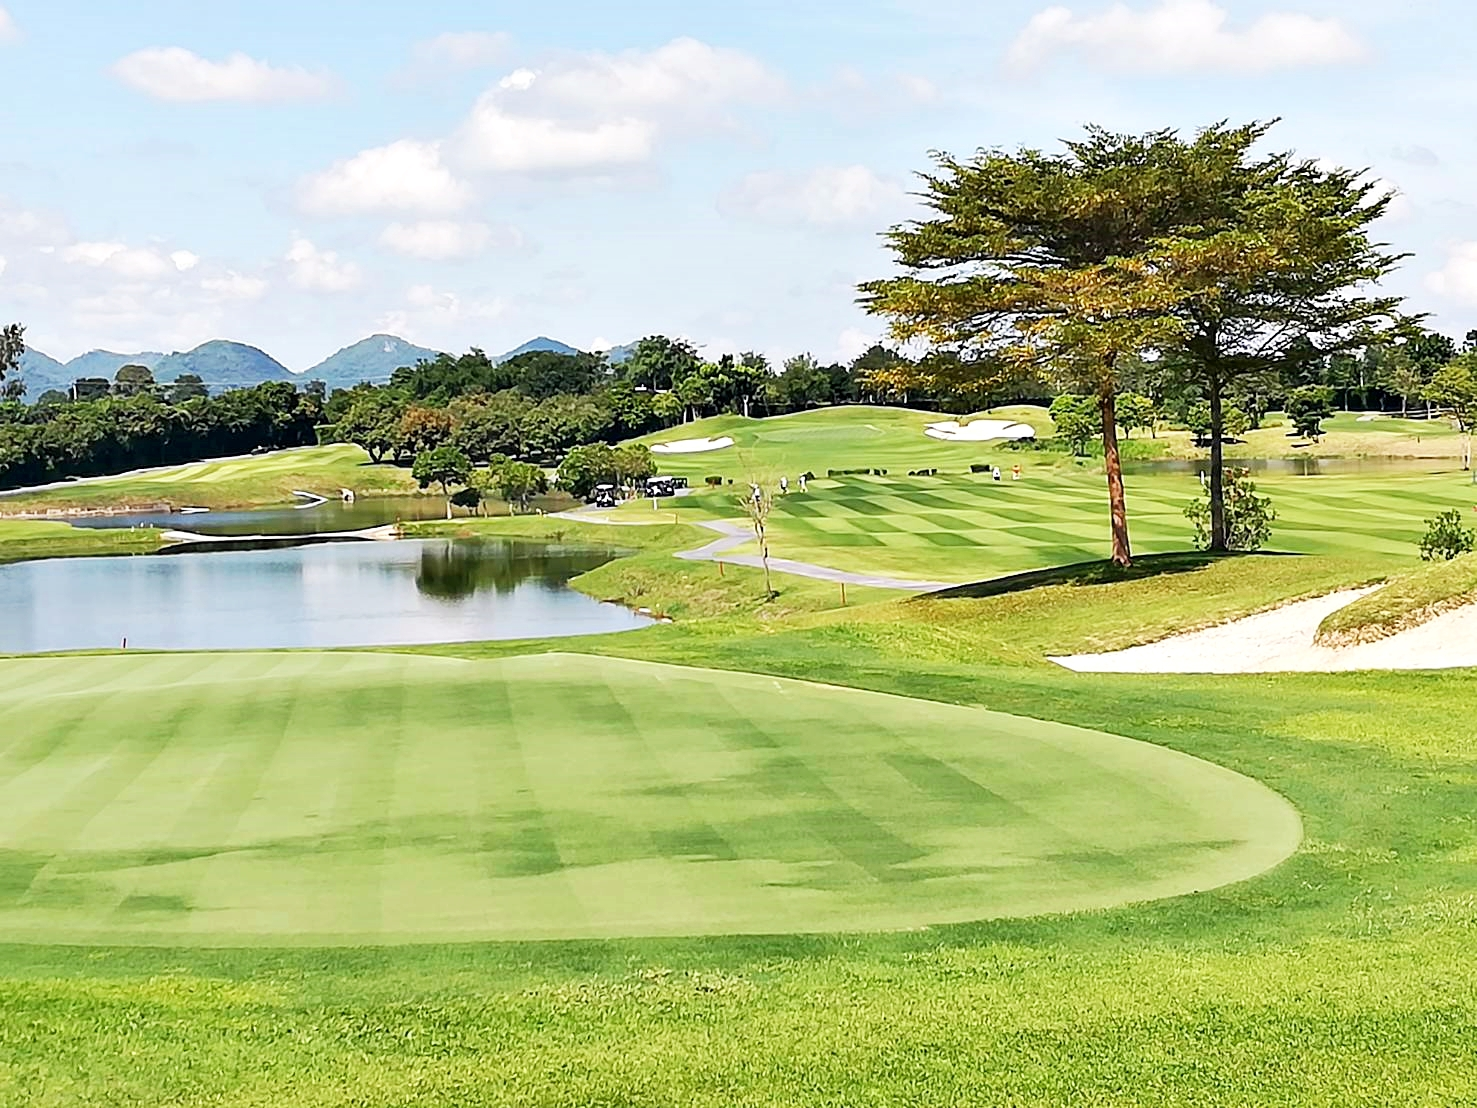 Rancho Charnvee Resort and Country Club Khao Yai